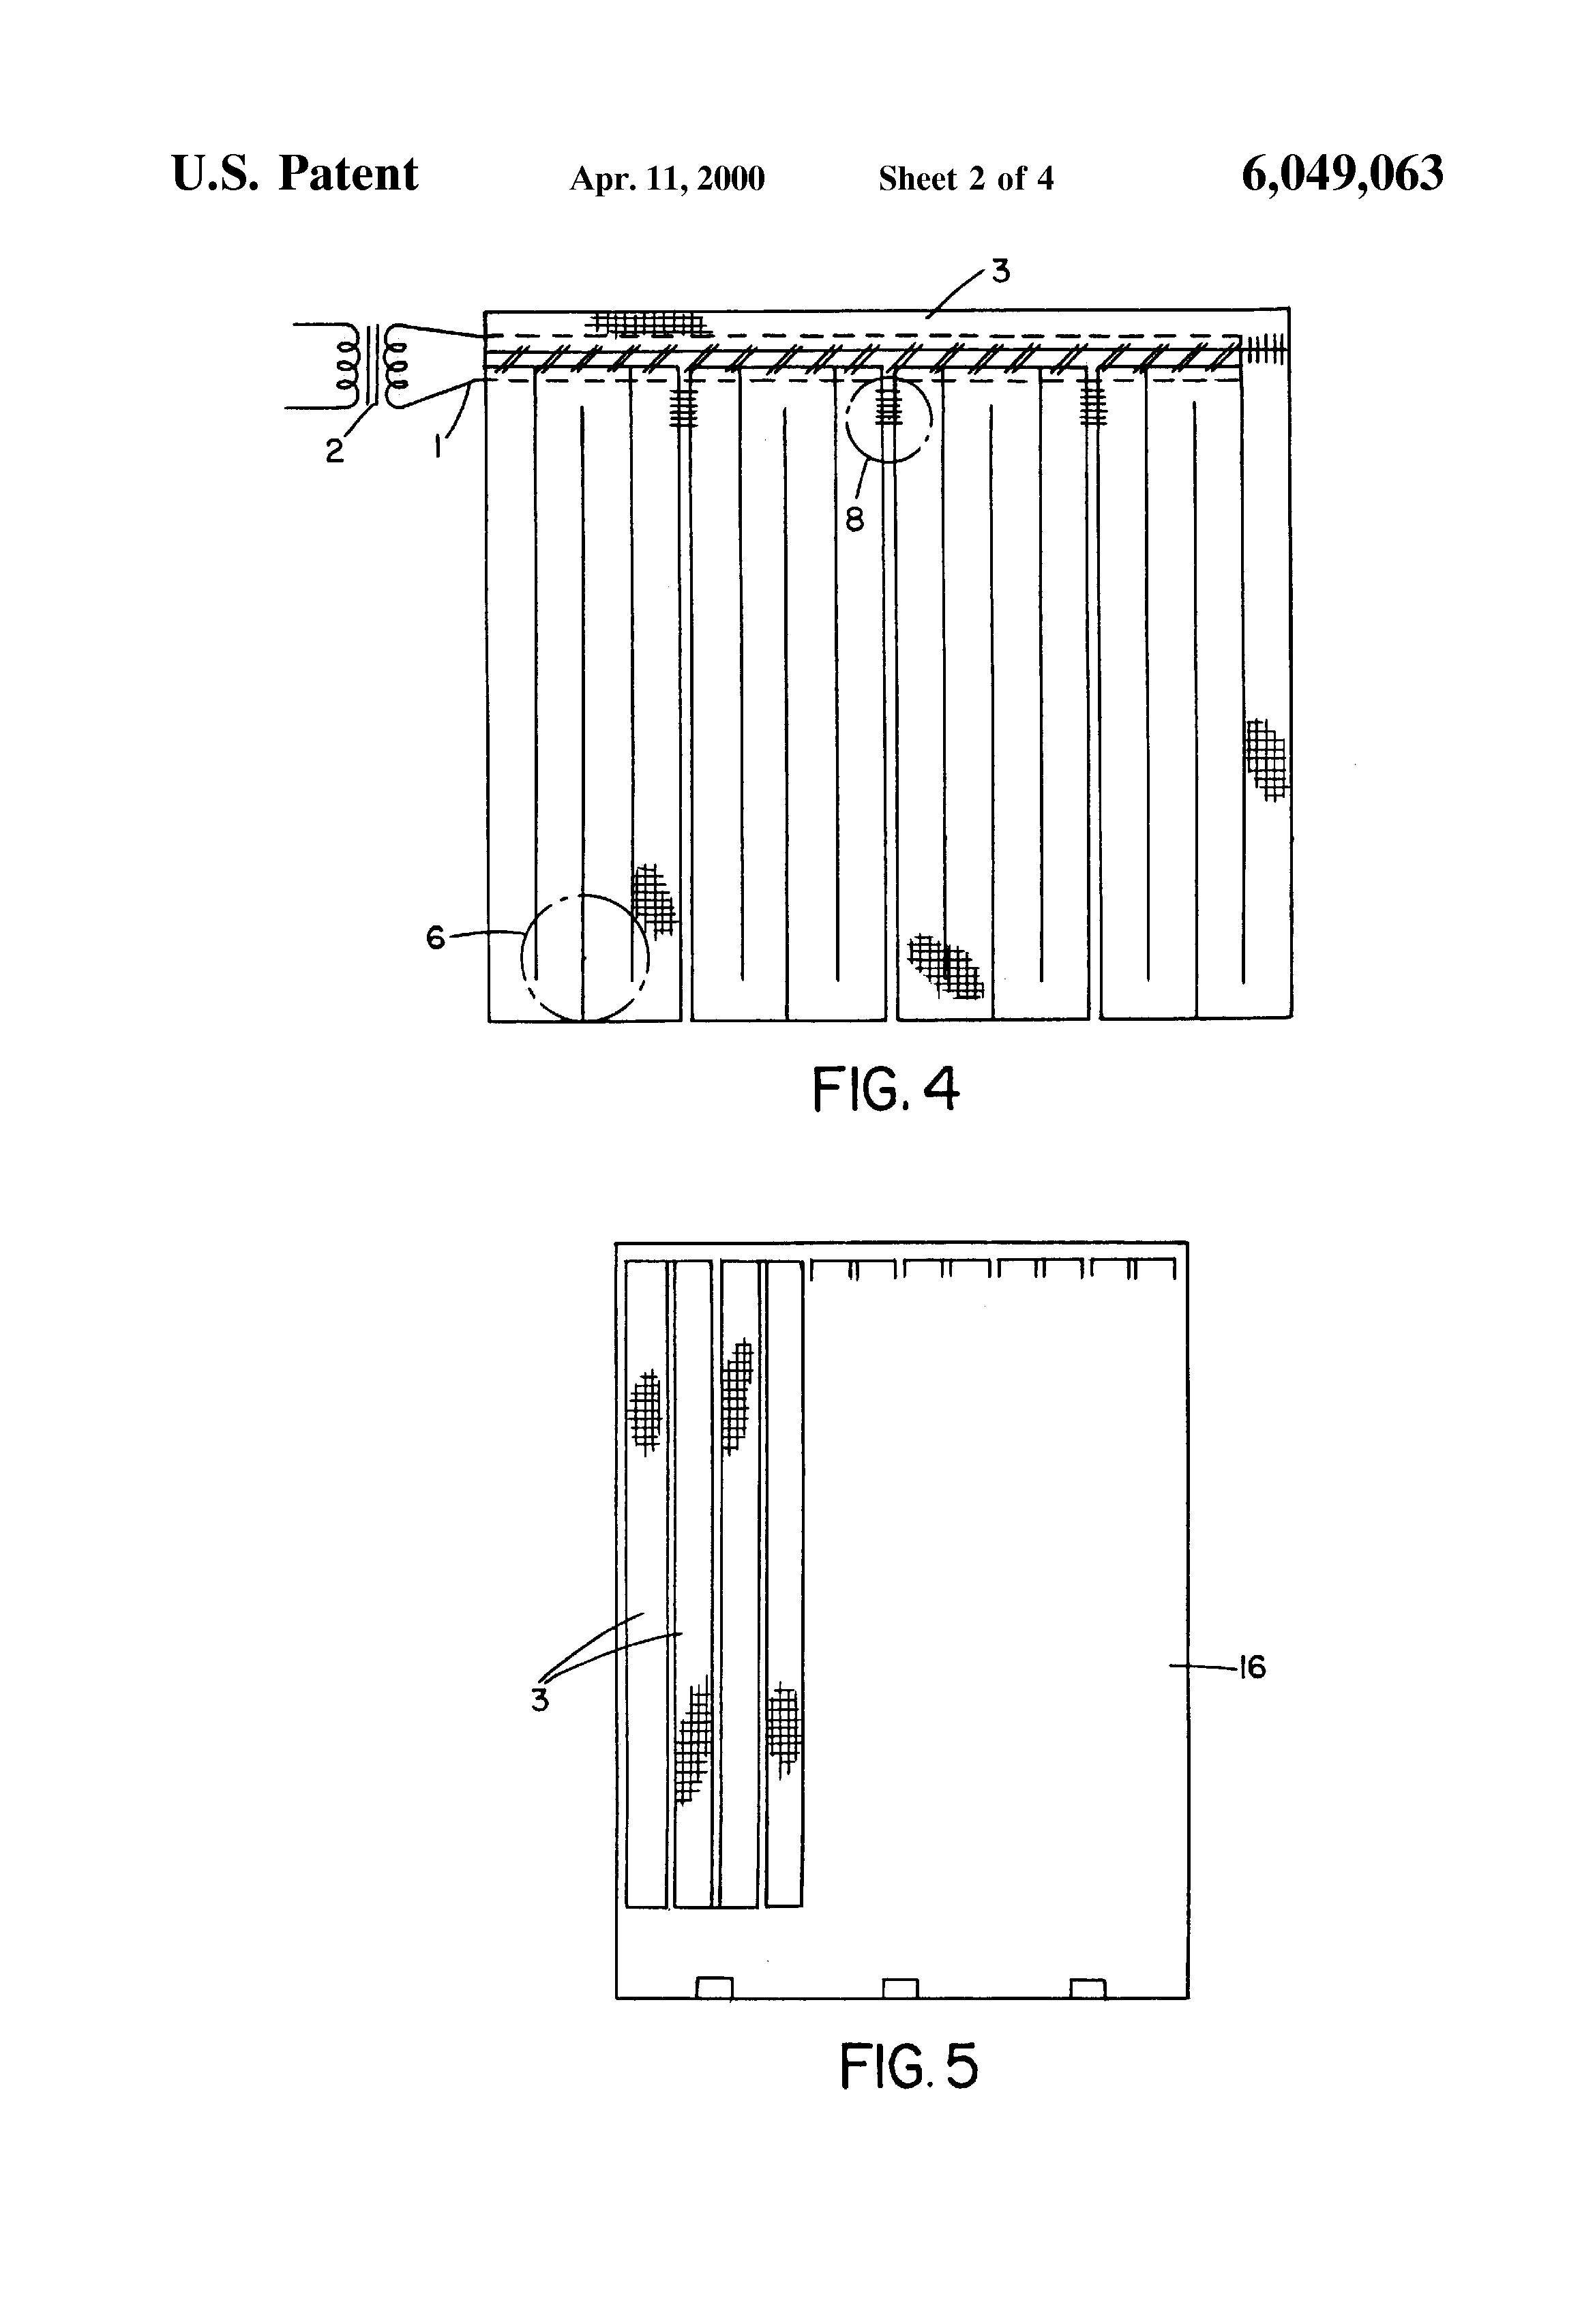 Low Voltage Heating Wire : Patent us low voltage wire mesh heating element